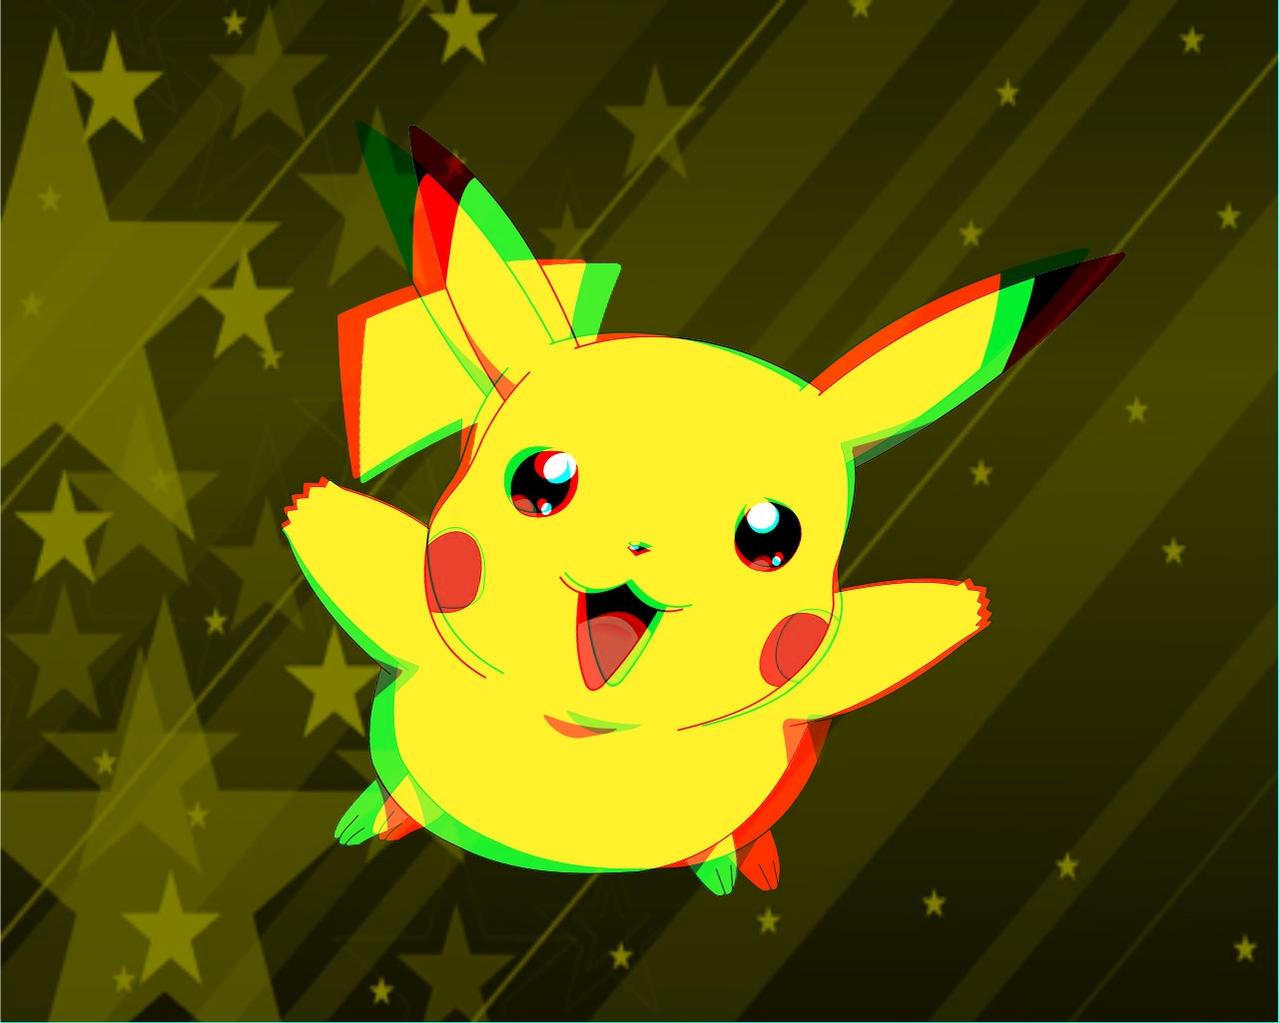 Pikachu3D - Wallpaper - 3D by Cpt-Doodle on DeviantArt